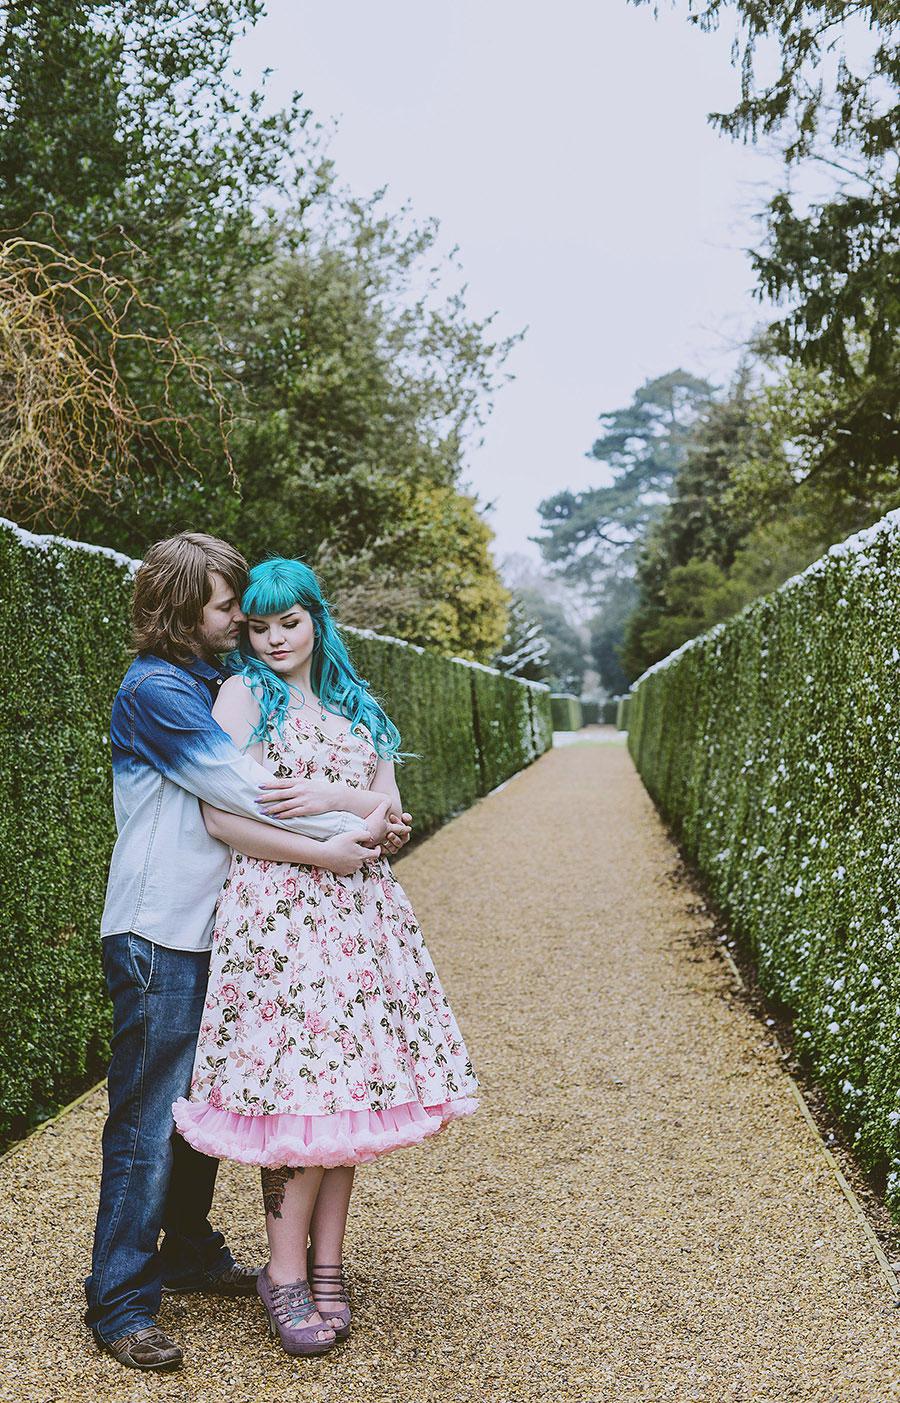 Romantic_Renaissance_Inspired_OffBeat_Engagement_Session_Katie_Drouet_Photography_12-rv